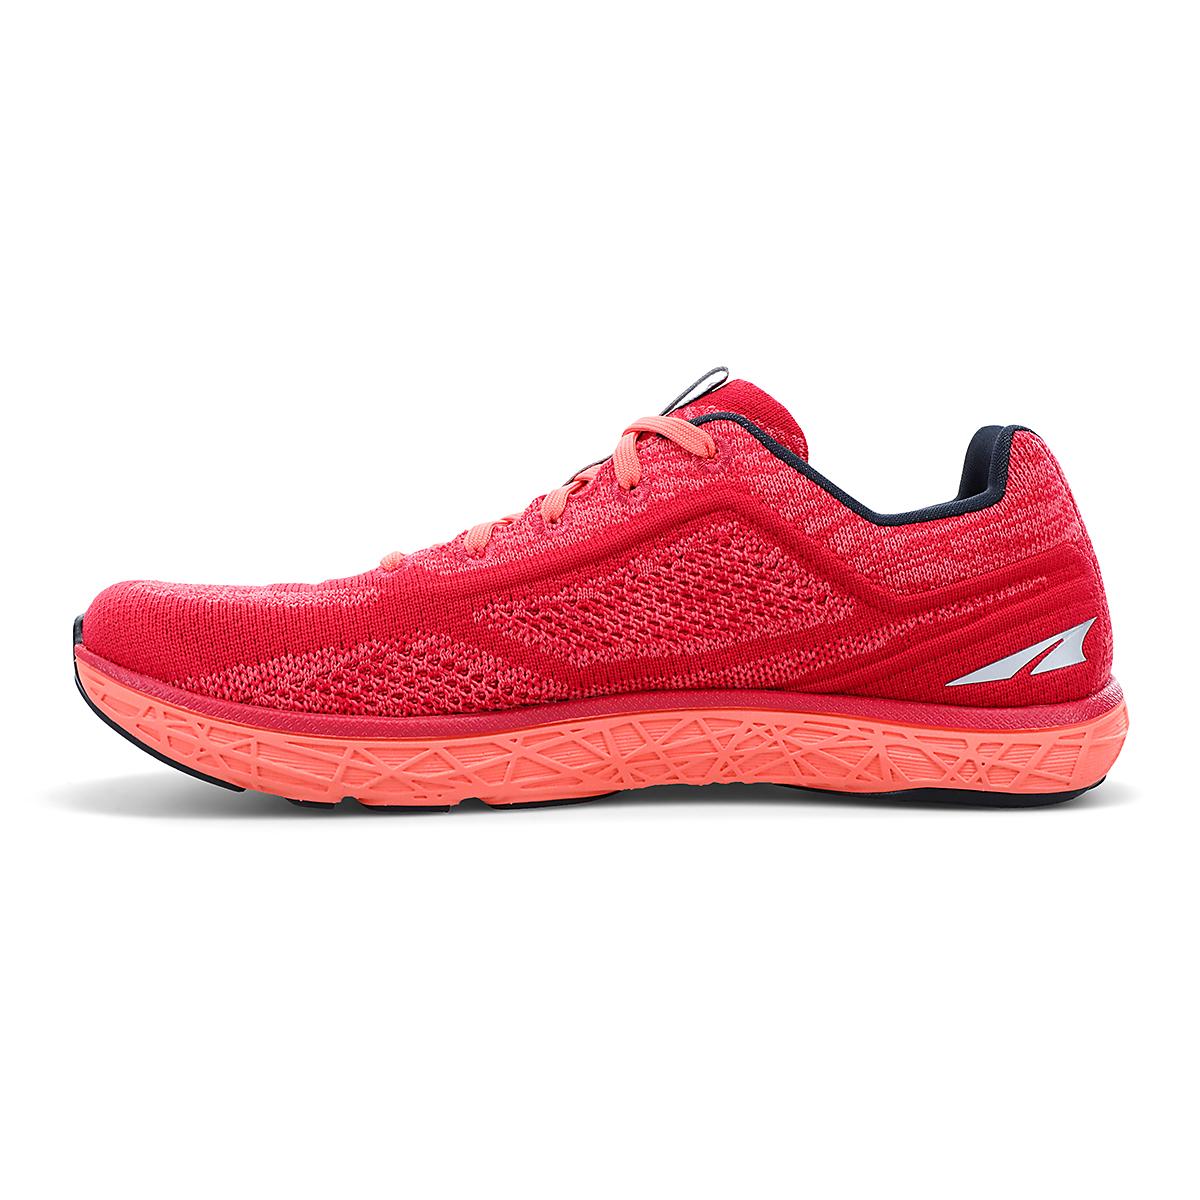 Women's Altra Escalante 2.5 Running Shoe - Color: Raspberry - Size: 5.5 - Width: Regular, Raspberry, large, image 2